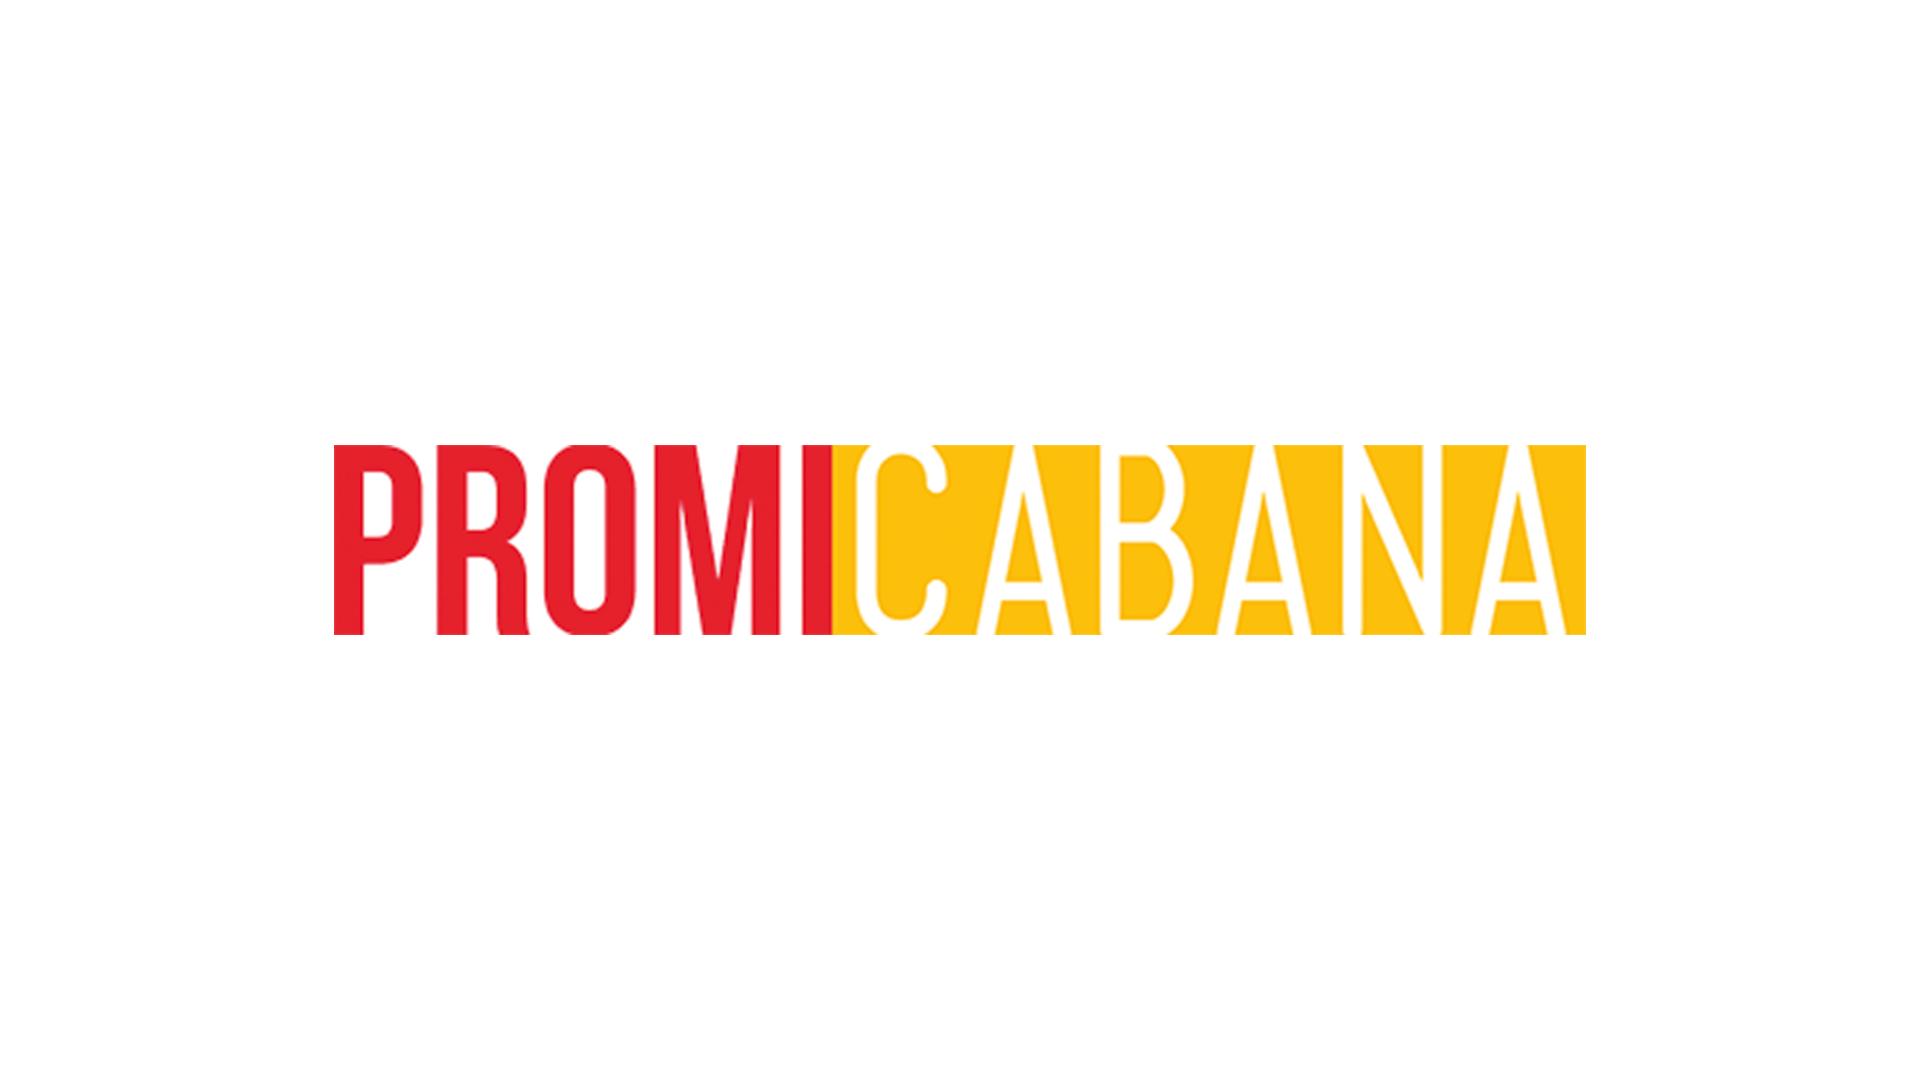 The-Lost-City-of-Z-Trailer-Robert-Pattinson